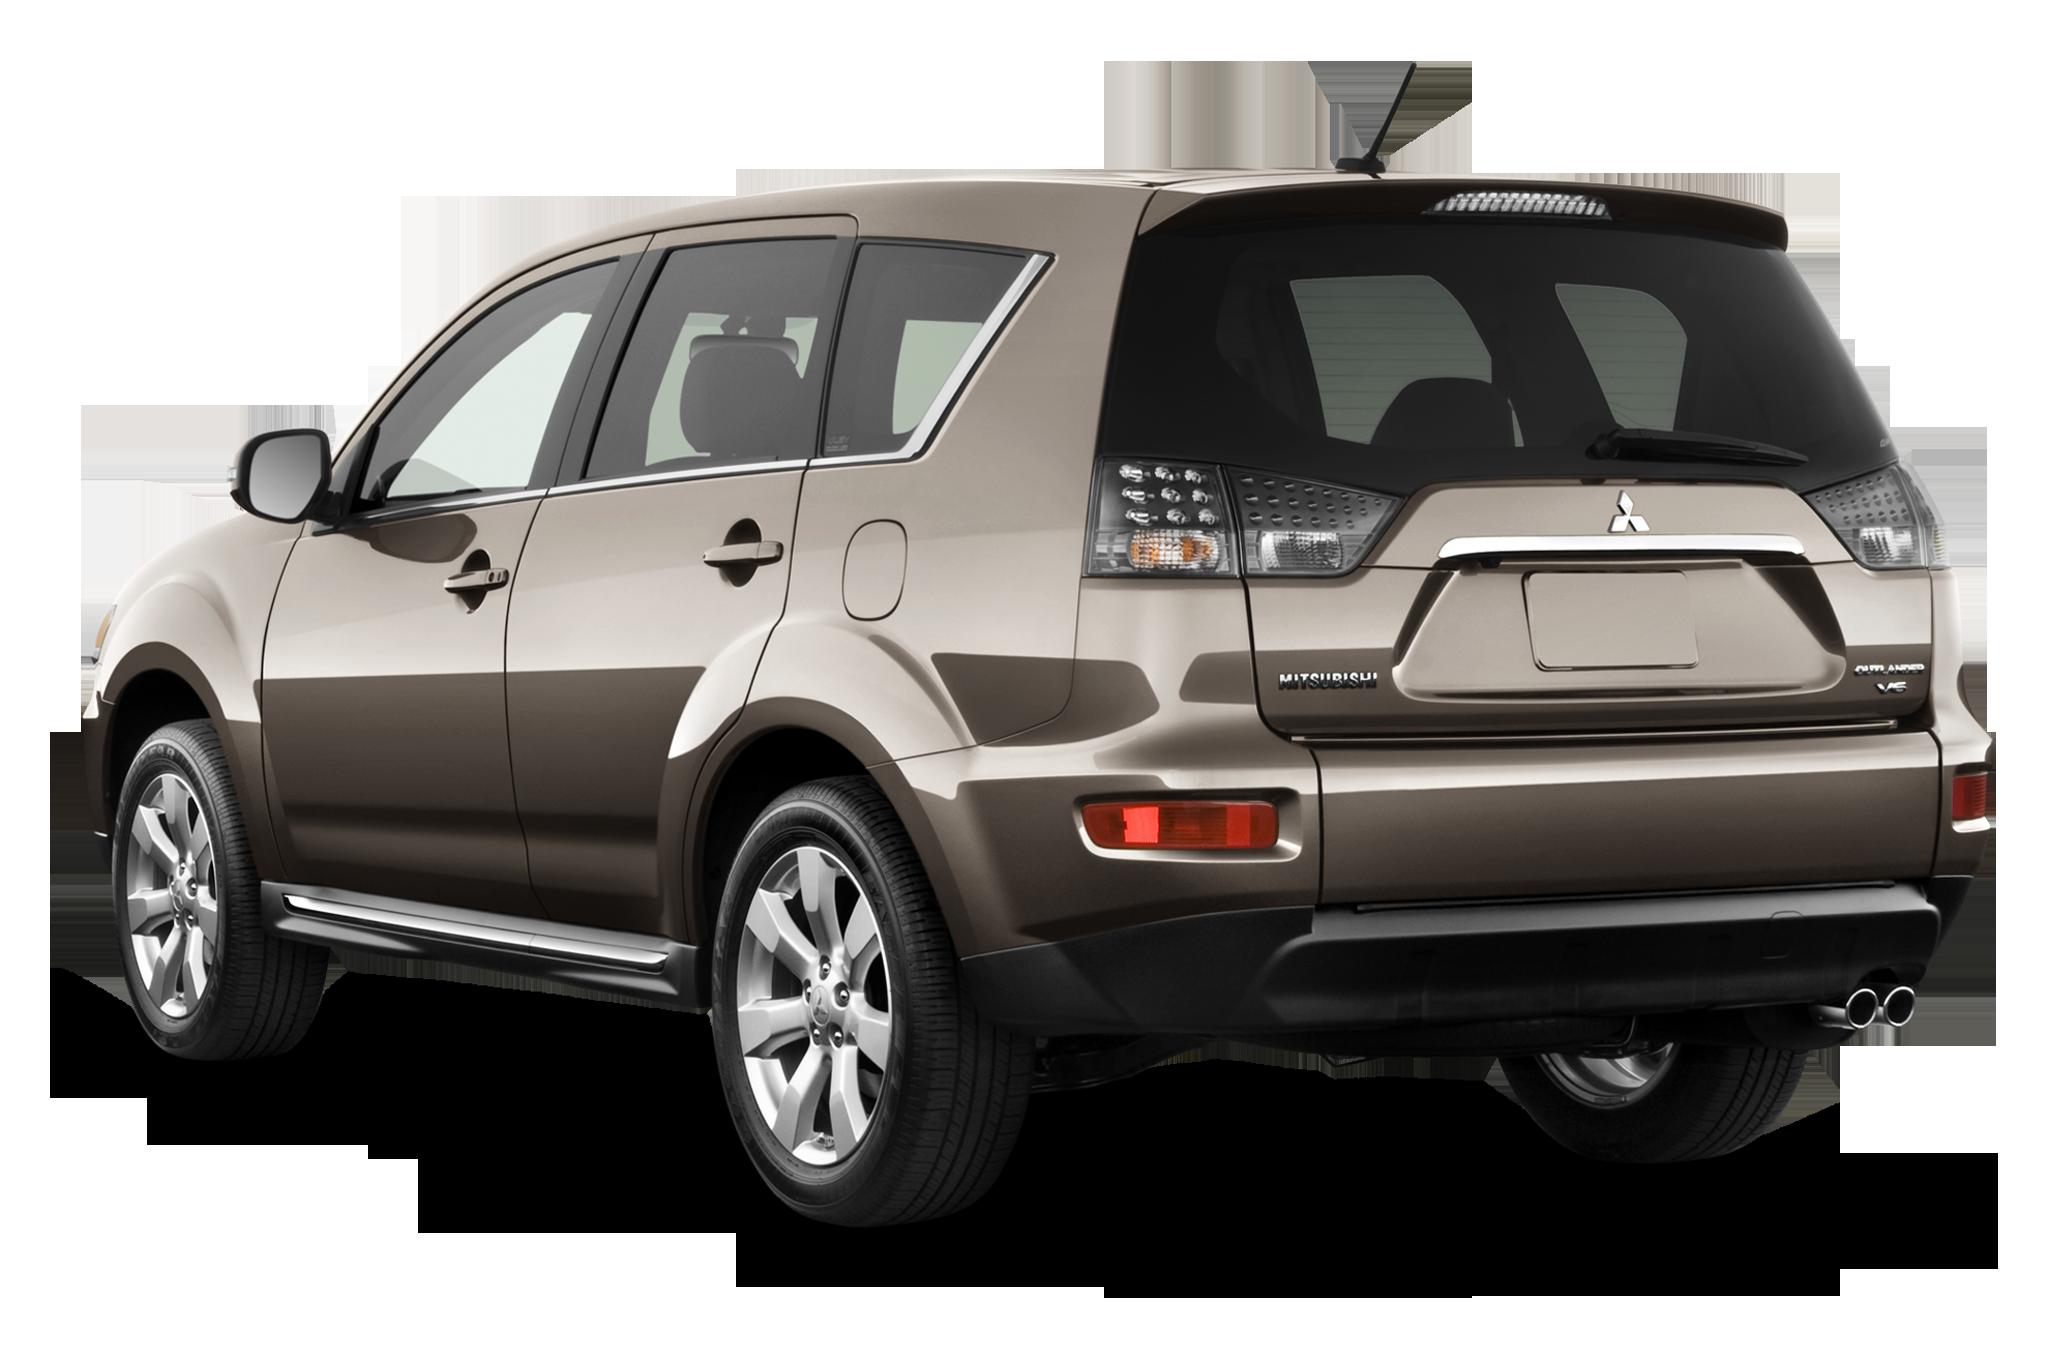 Mitsubishi To Focus On Small Cars Uncertain Future For U